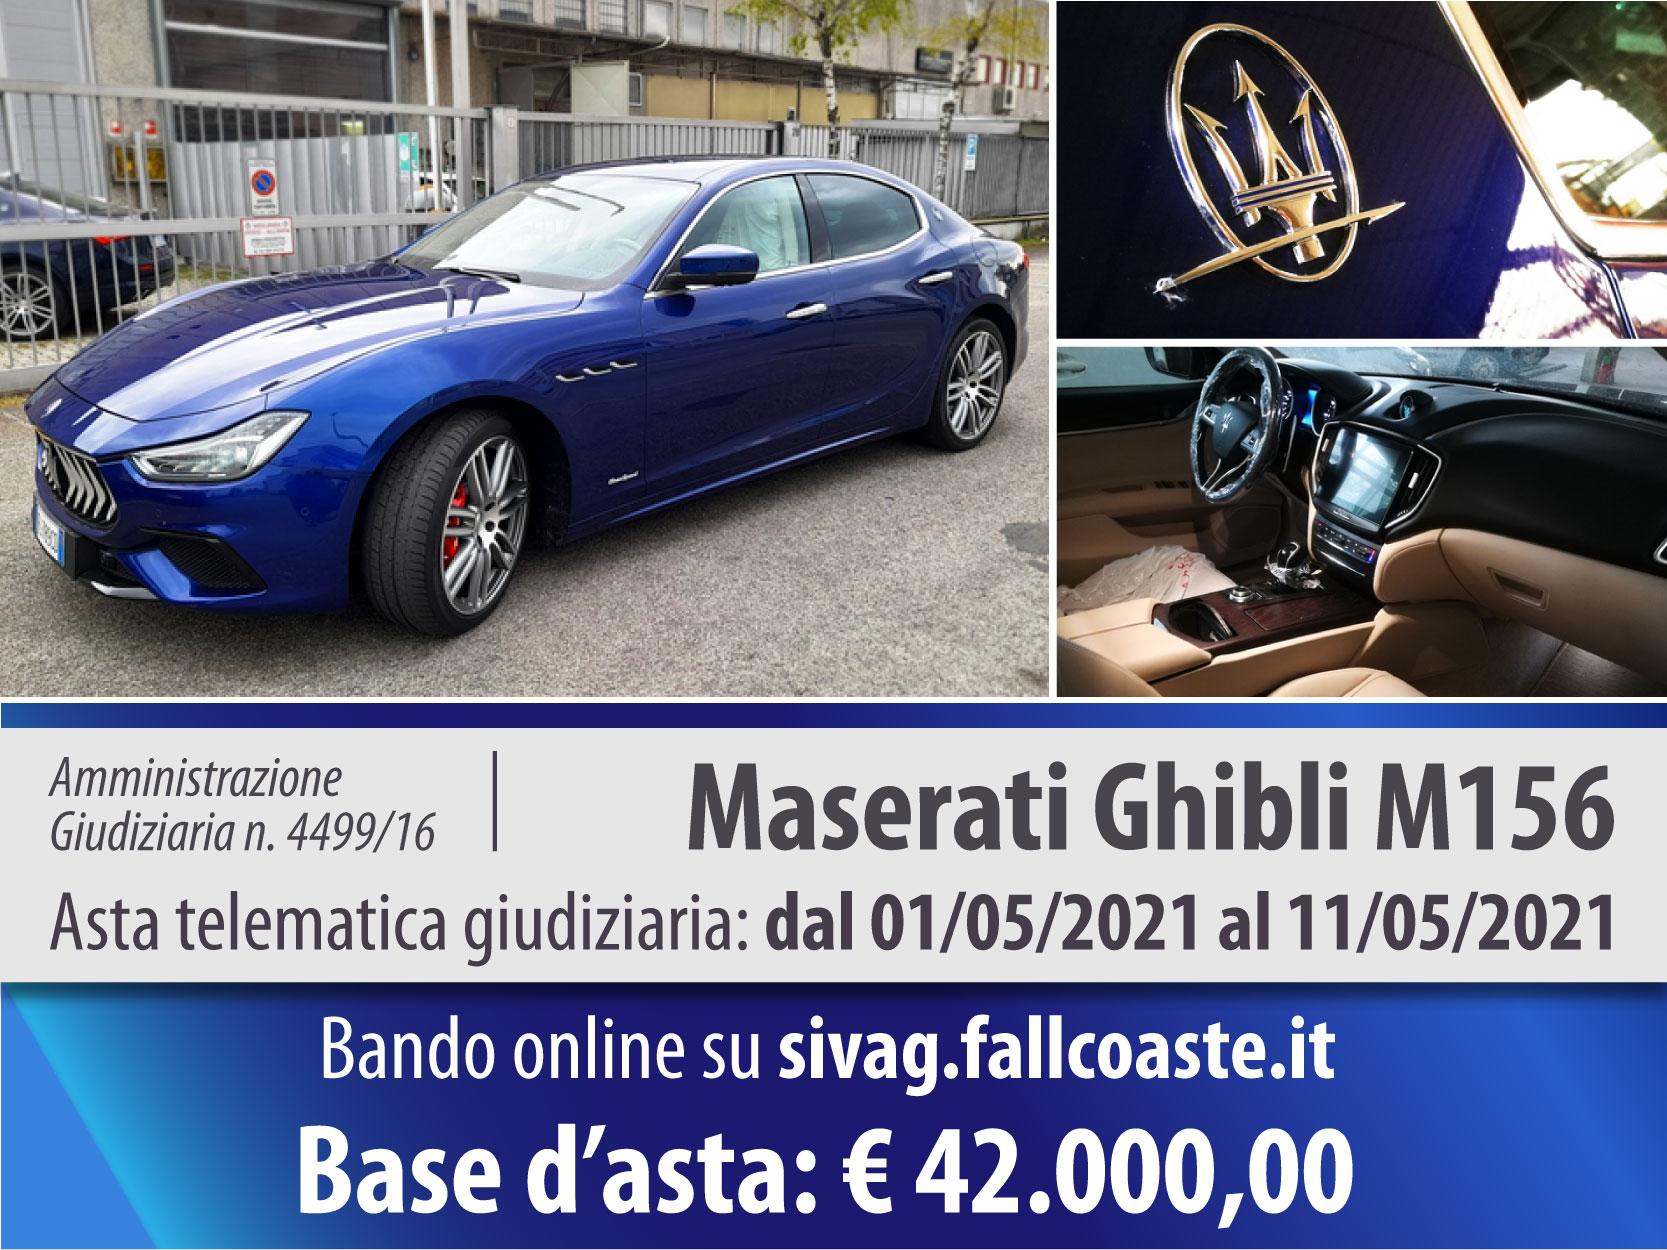 Pop up_Maserati_130421.jpg